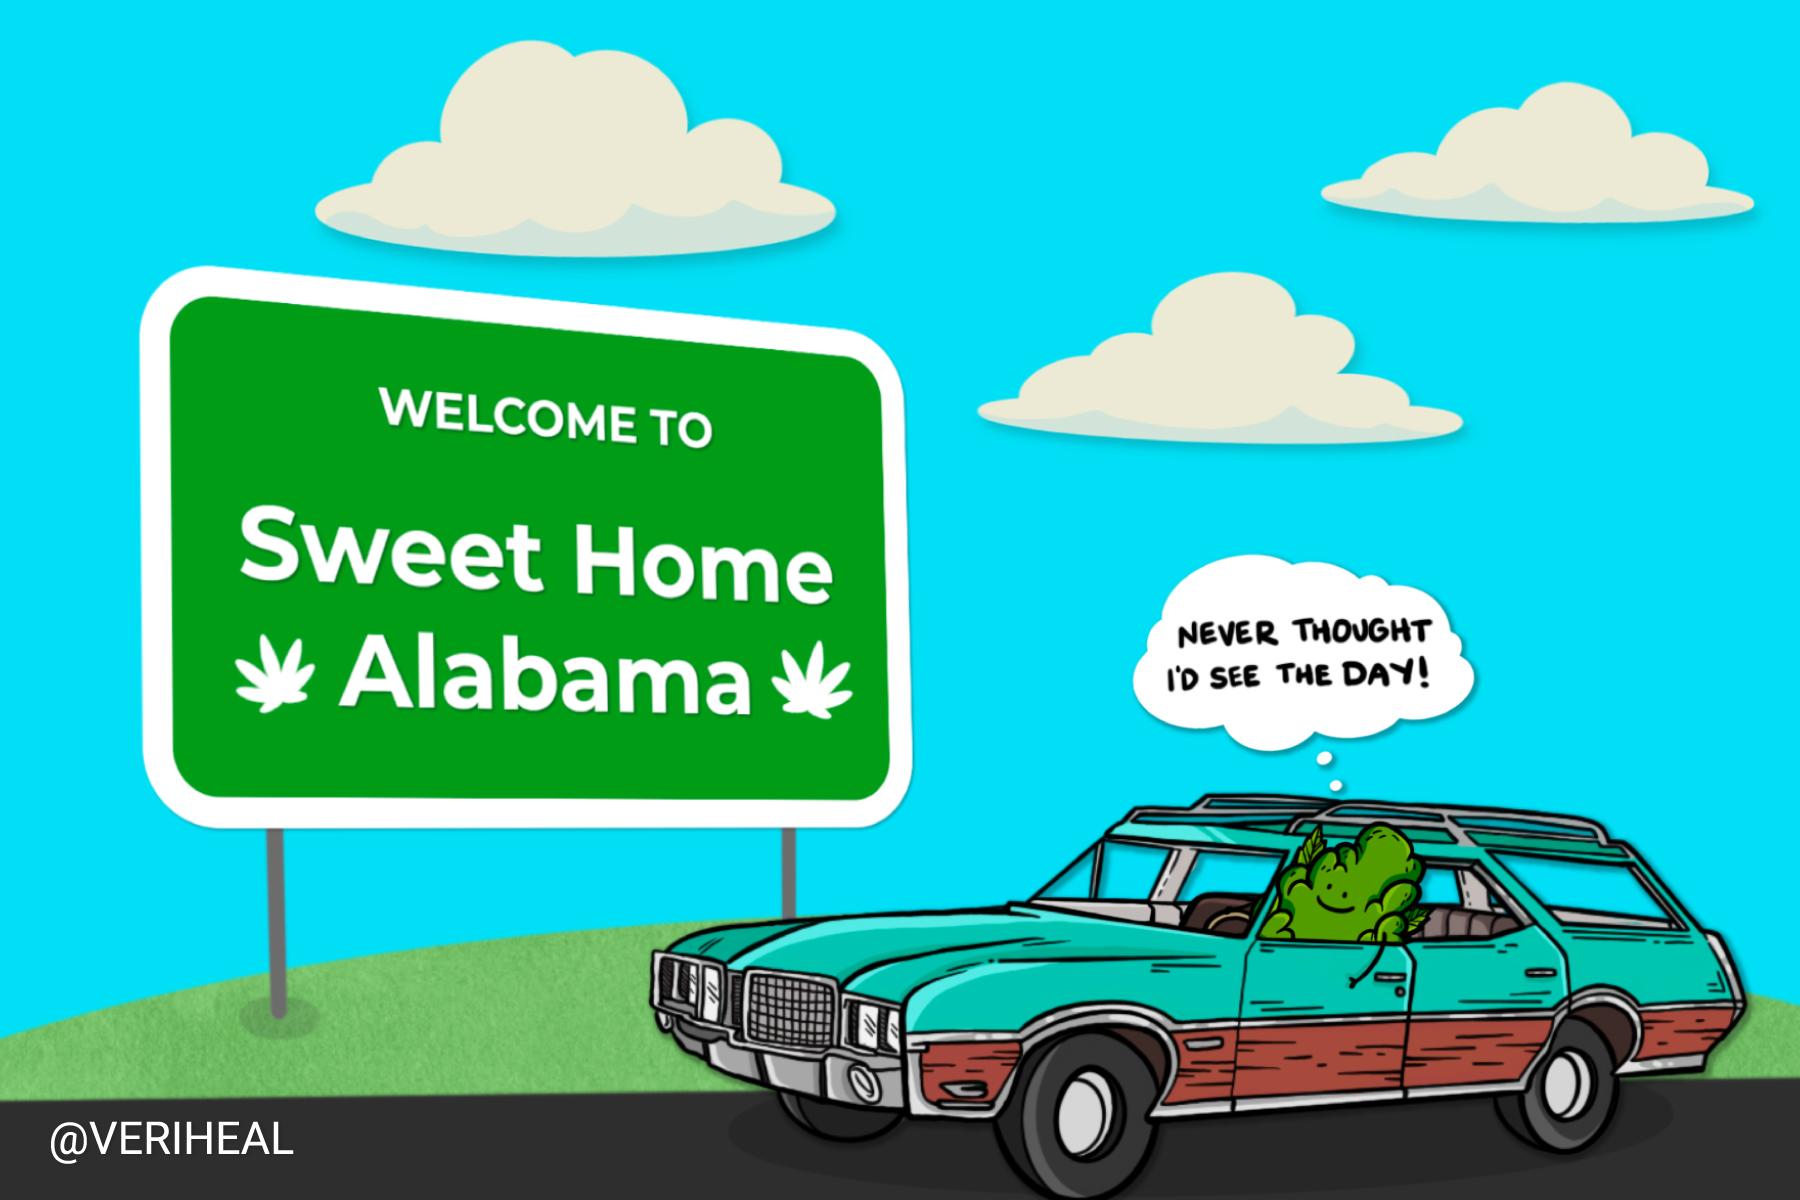 Alabama Medical Cannabis Legalization Might Soon Be on the Horizon